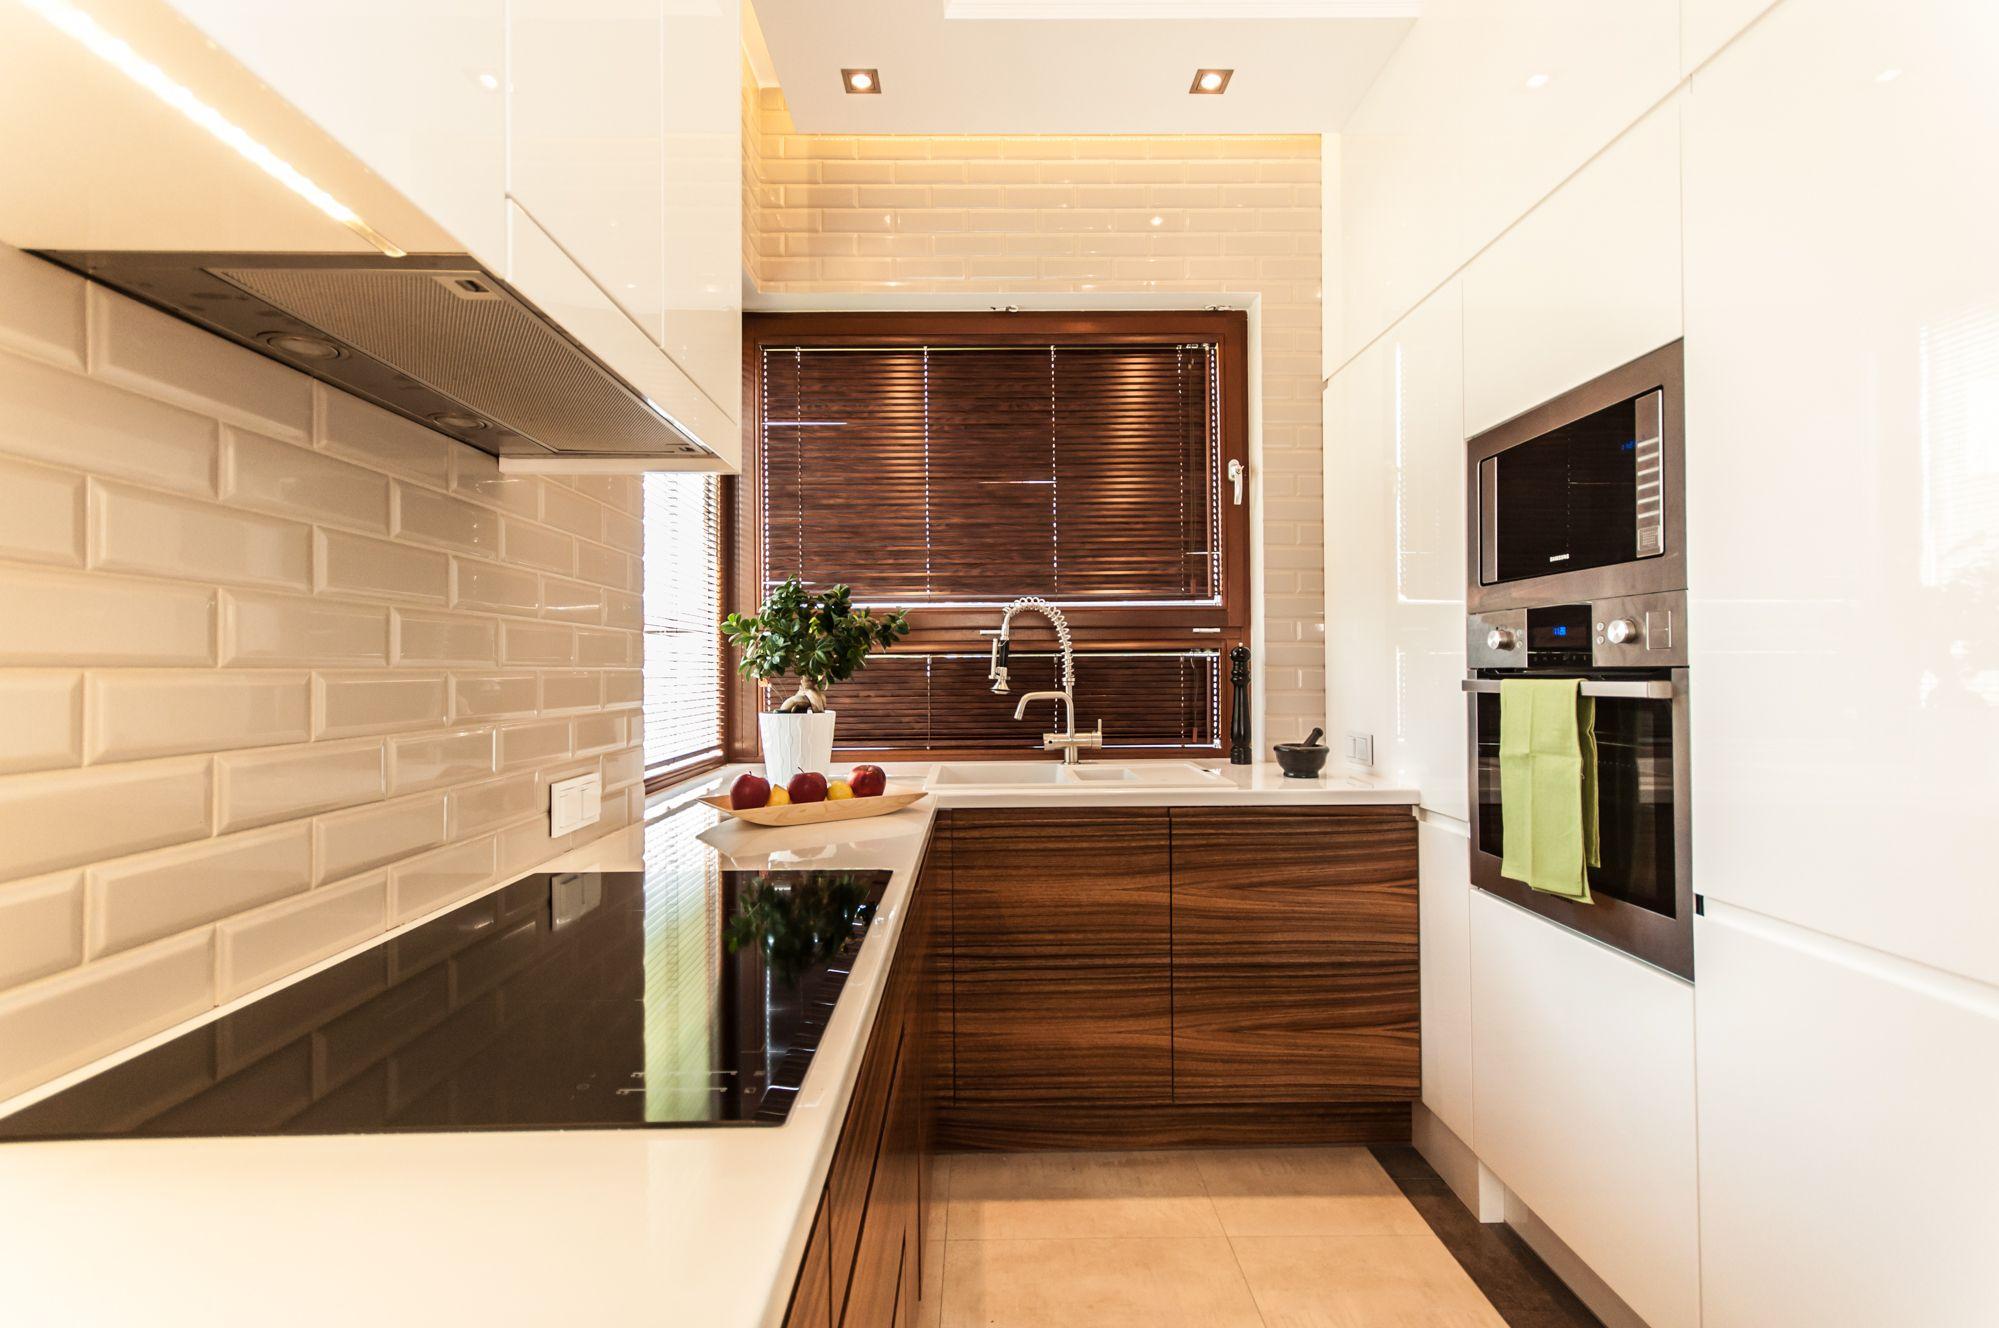 Biala Kuchnia Z Elementami Cegly I Drewna House Design Home Architect